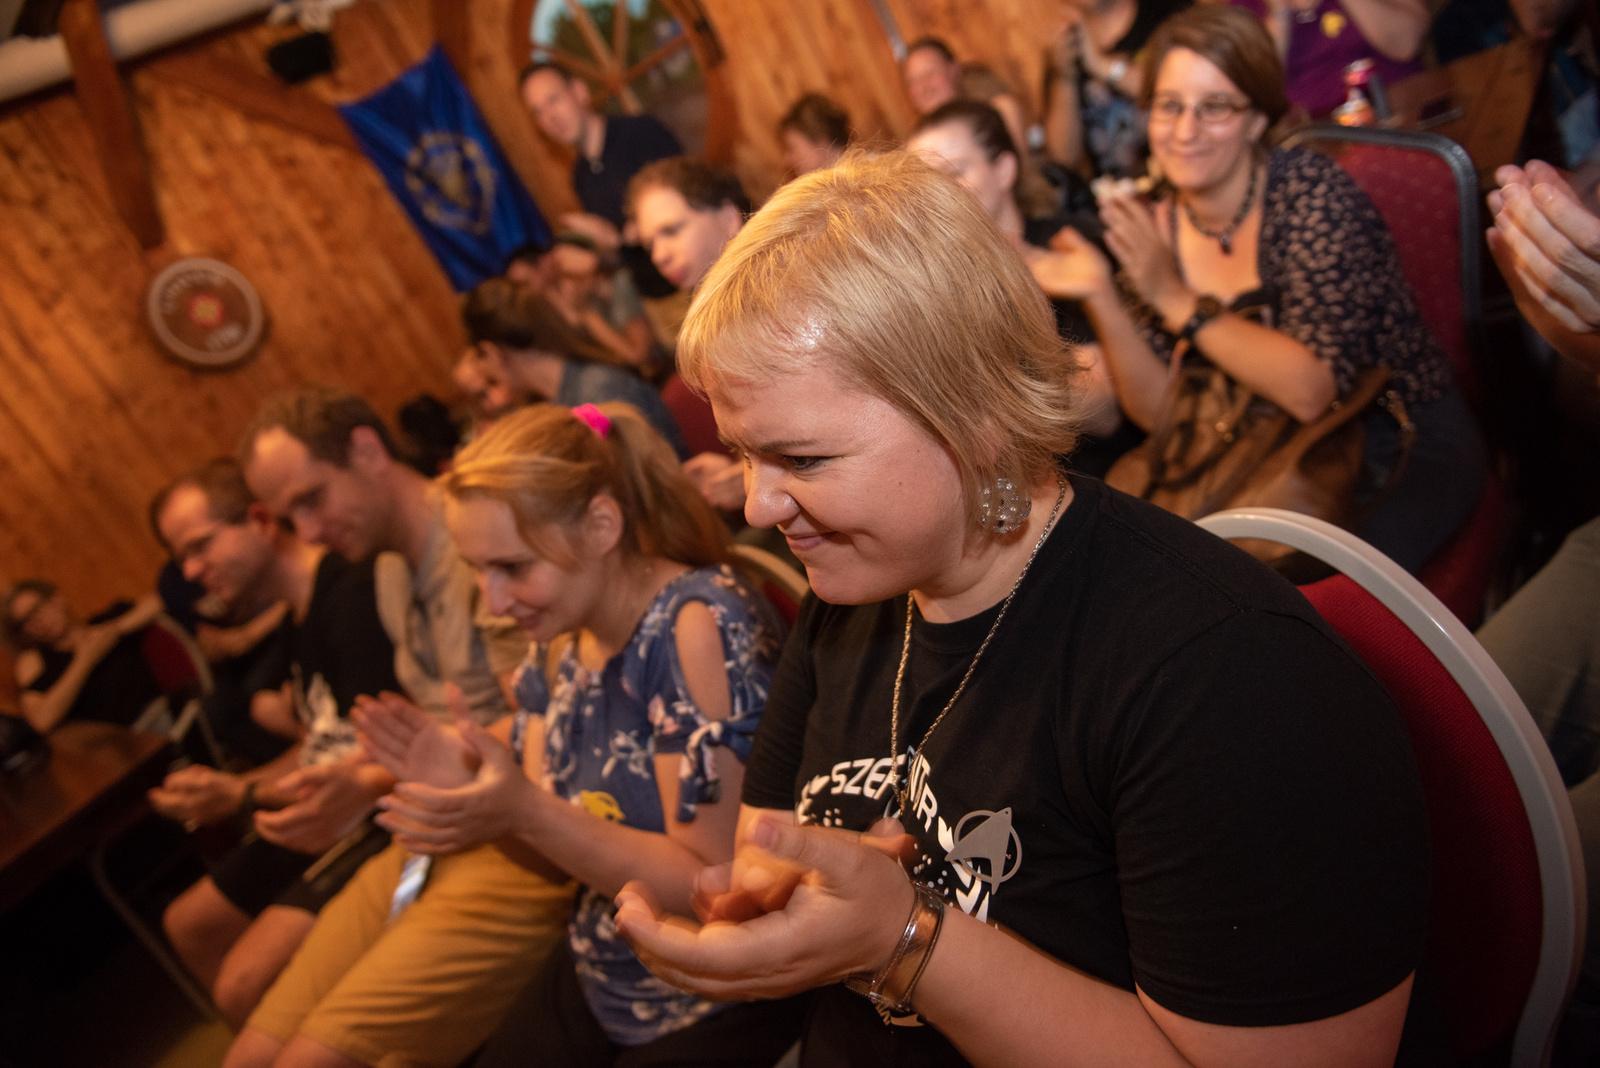 (fotó: Antal Zsani / emTV.hu)